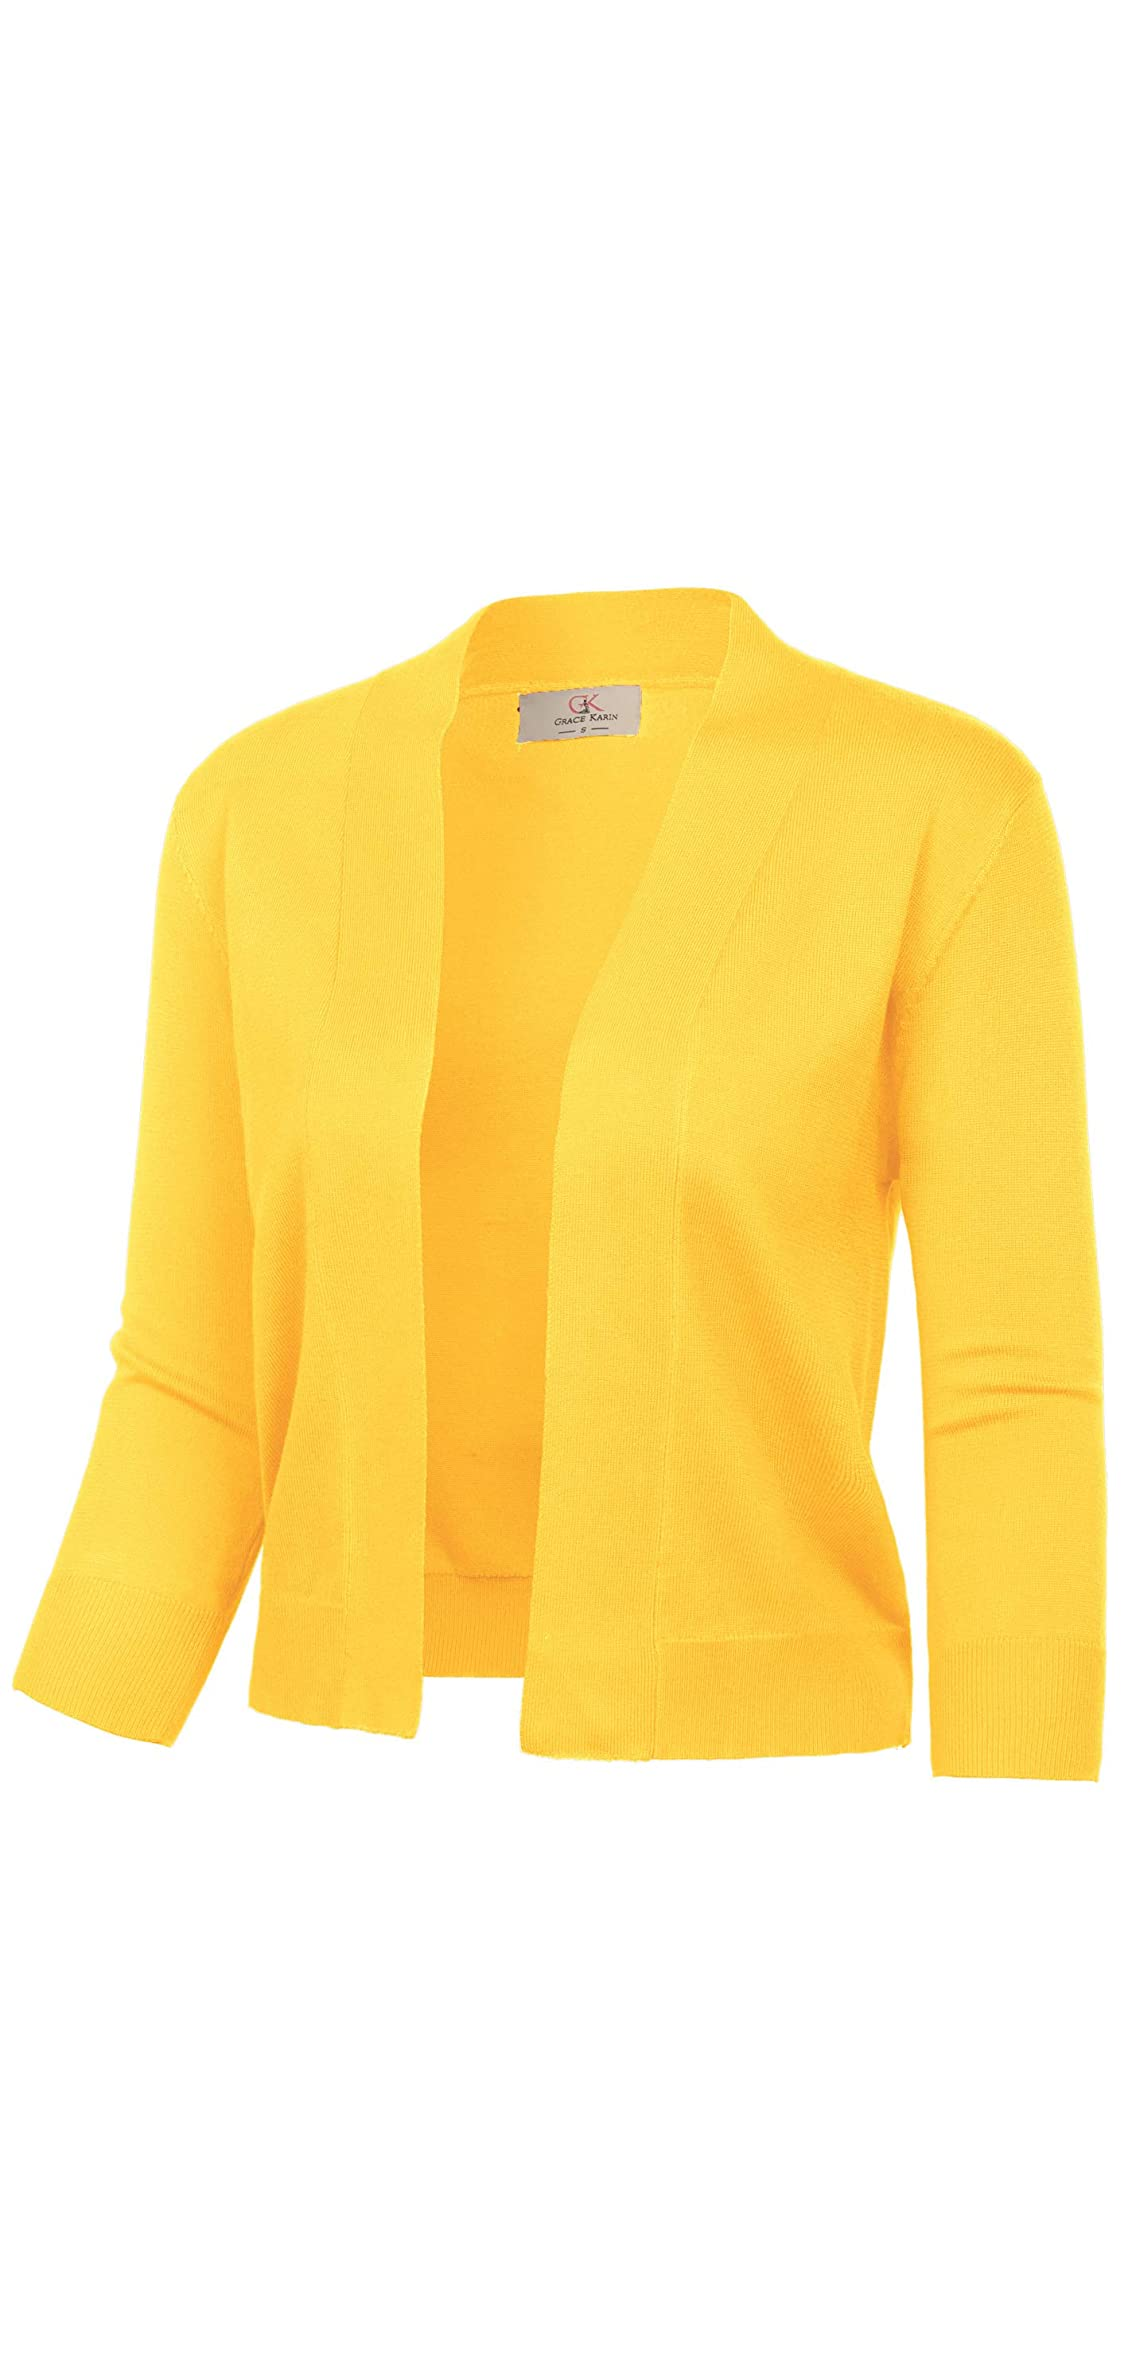 Women's / Sleeve Cardigan Knit Sweaters Cropped